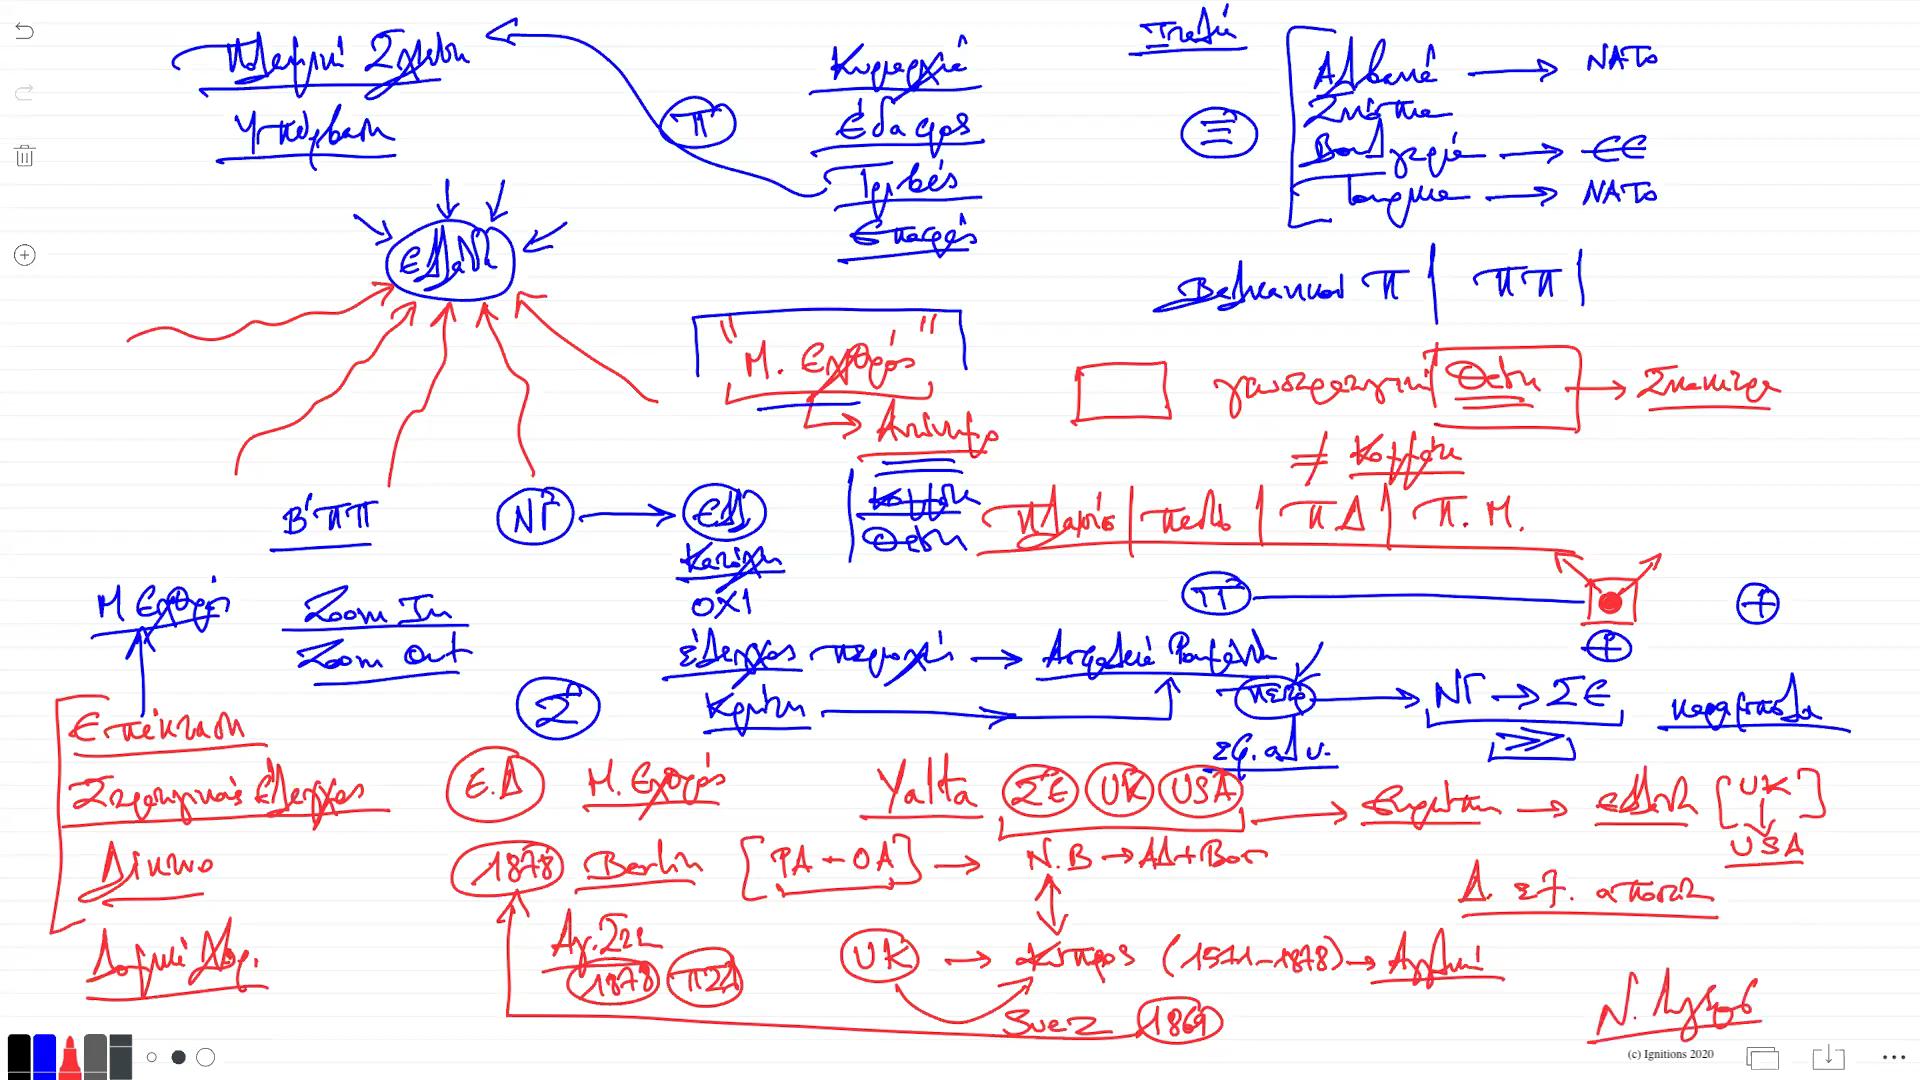 56024 - XIV - e-Διάλεξη: Ελληνική Γεωστρατηγική I. (Dessin)